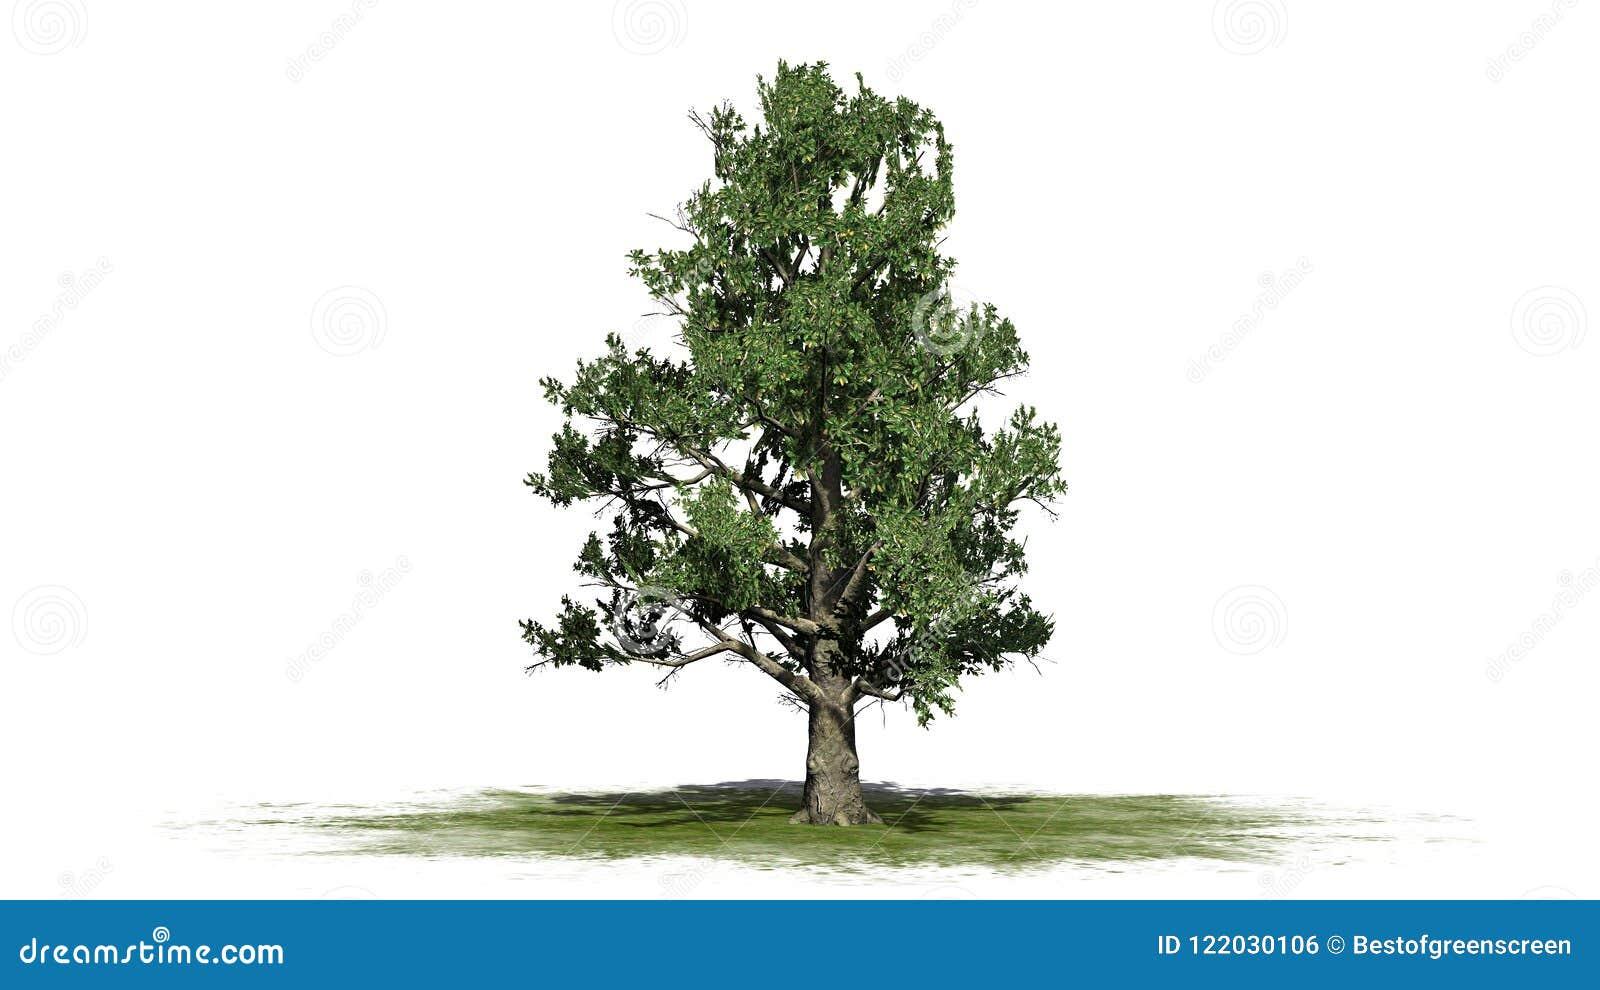 Southern Magnolia Tree Stock Illustration Illustration Of Landscaping 122030106